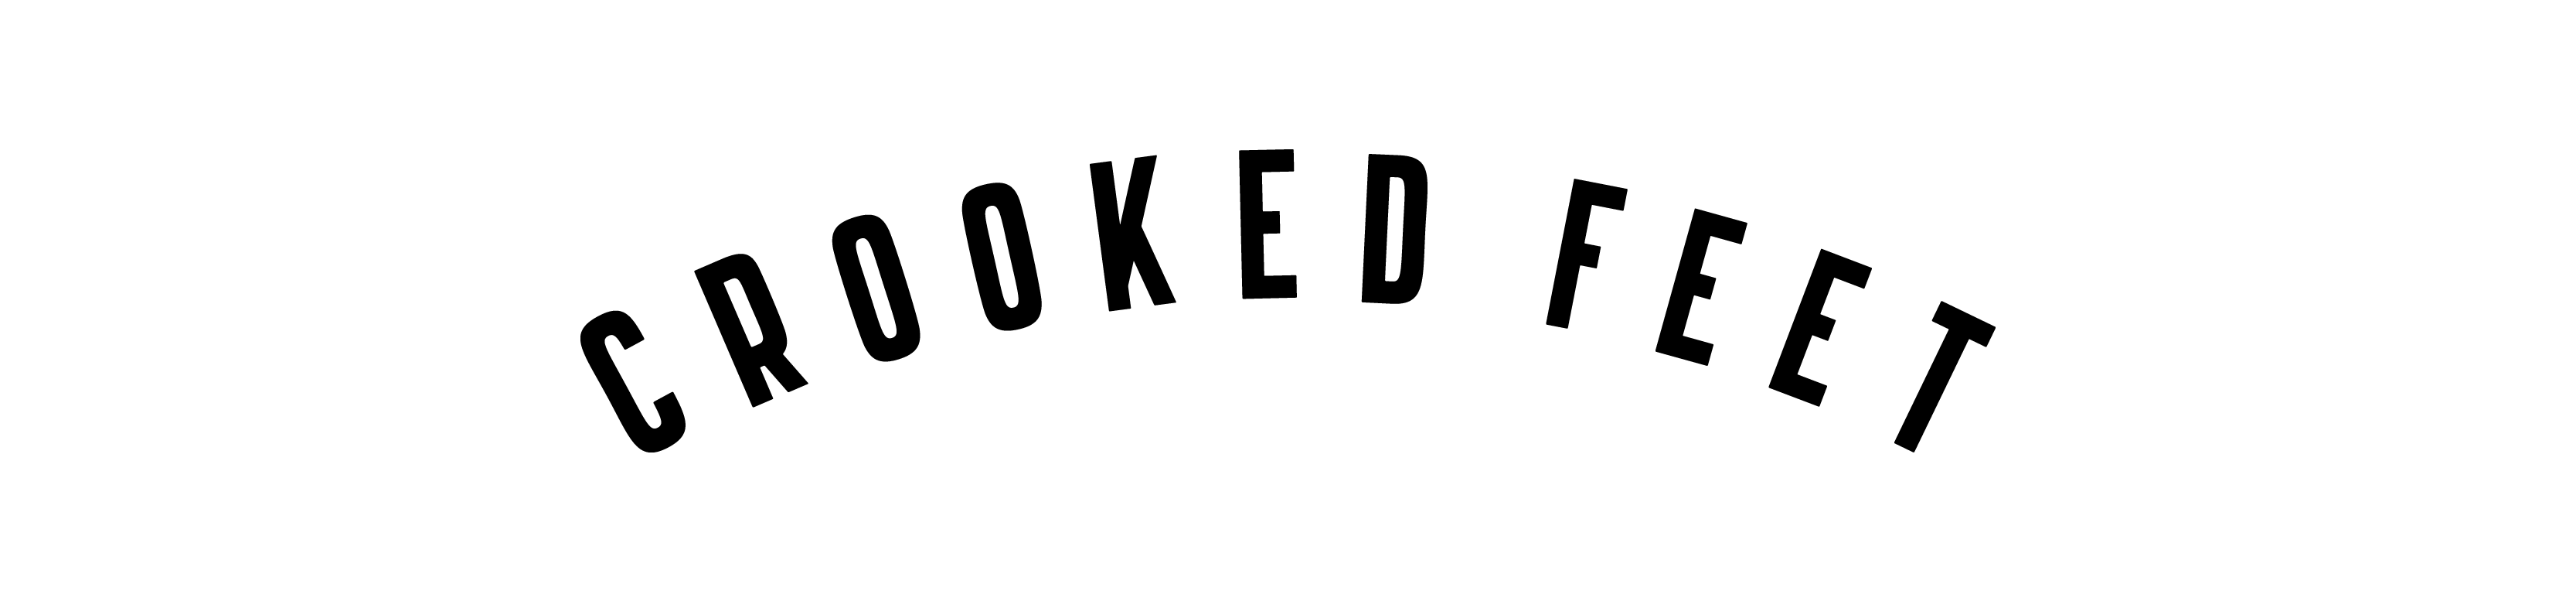 Crooked Feet